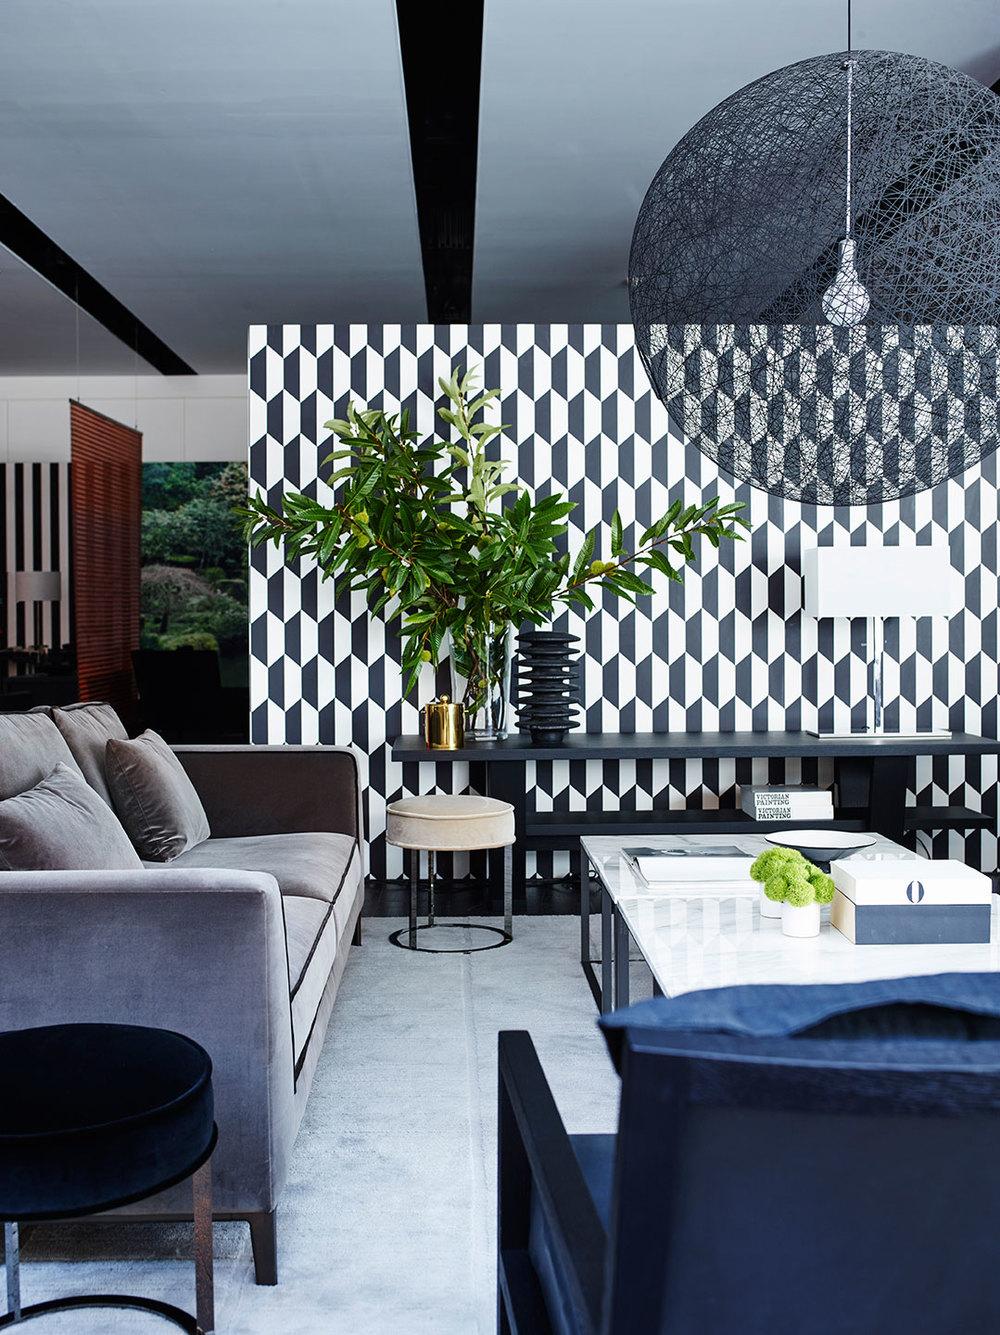 WEBSpace_Furniture_Steve_Cordony_150216_127720.jpg